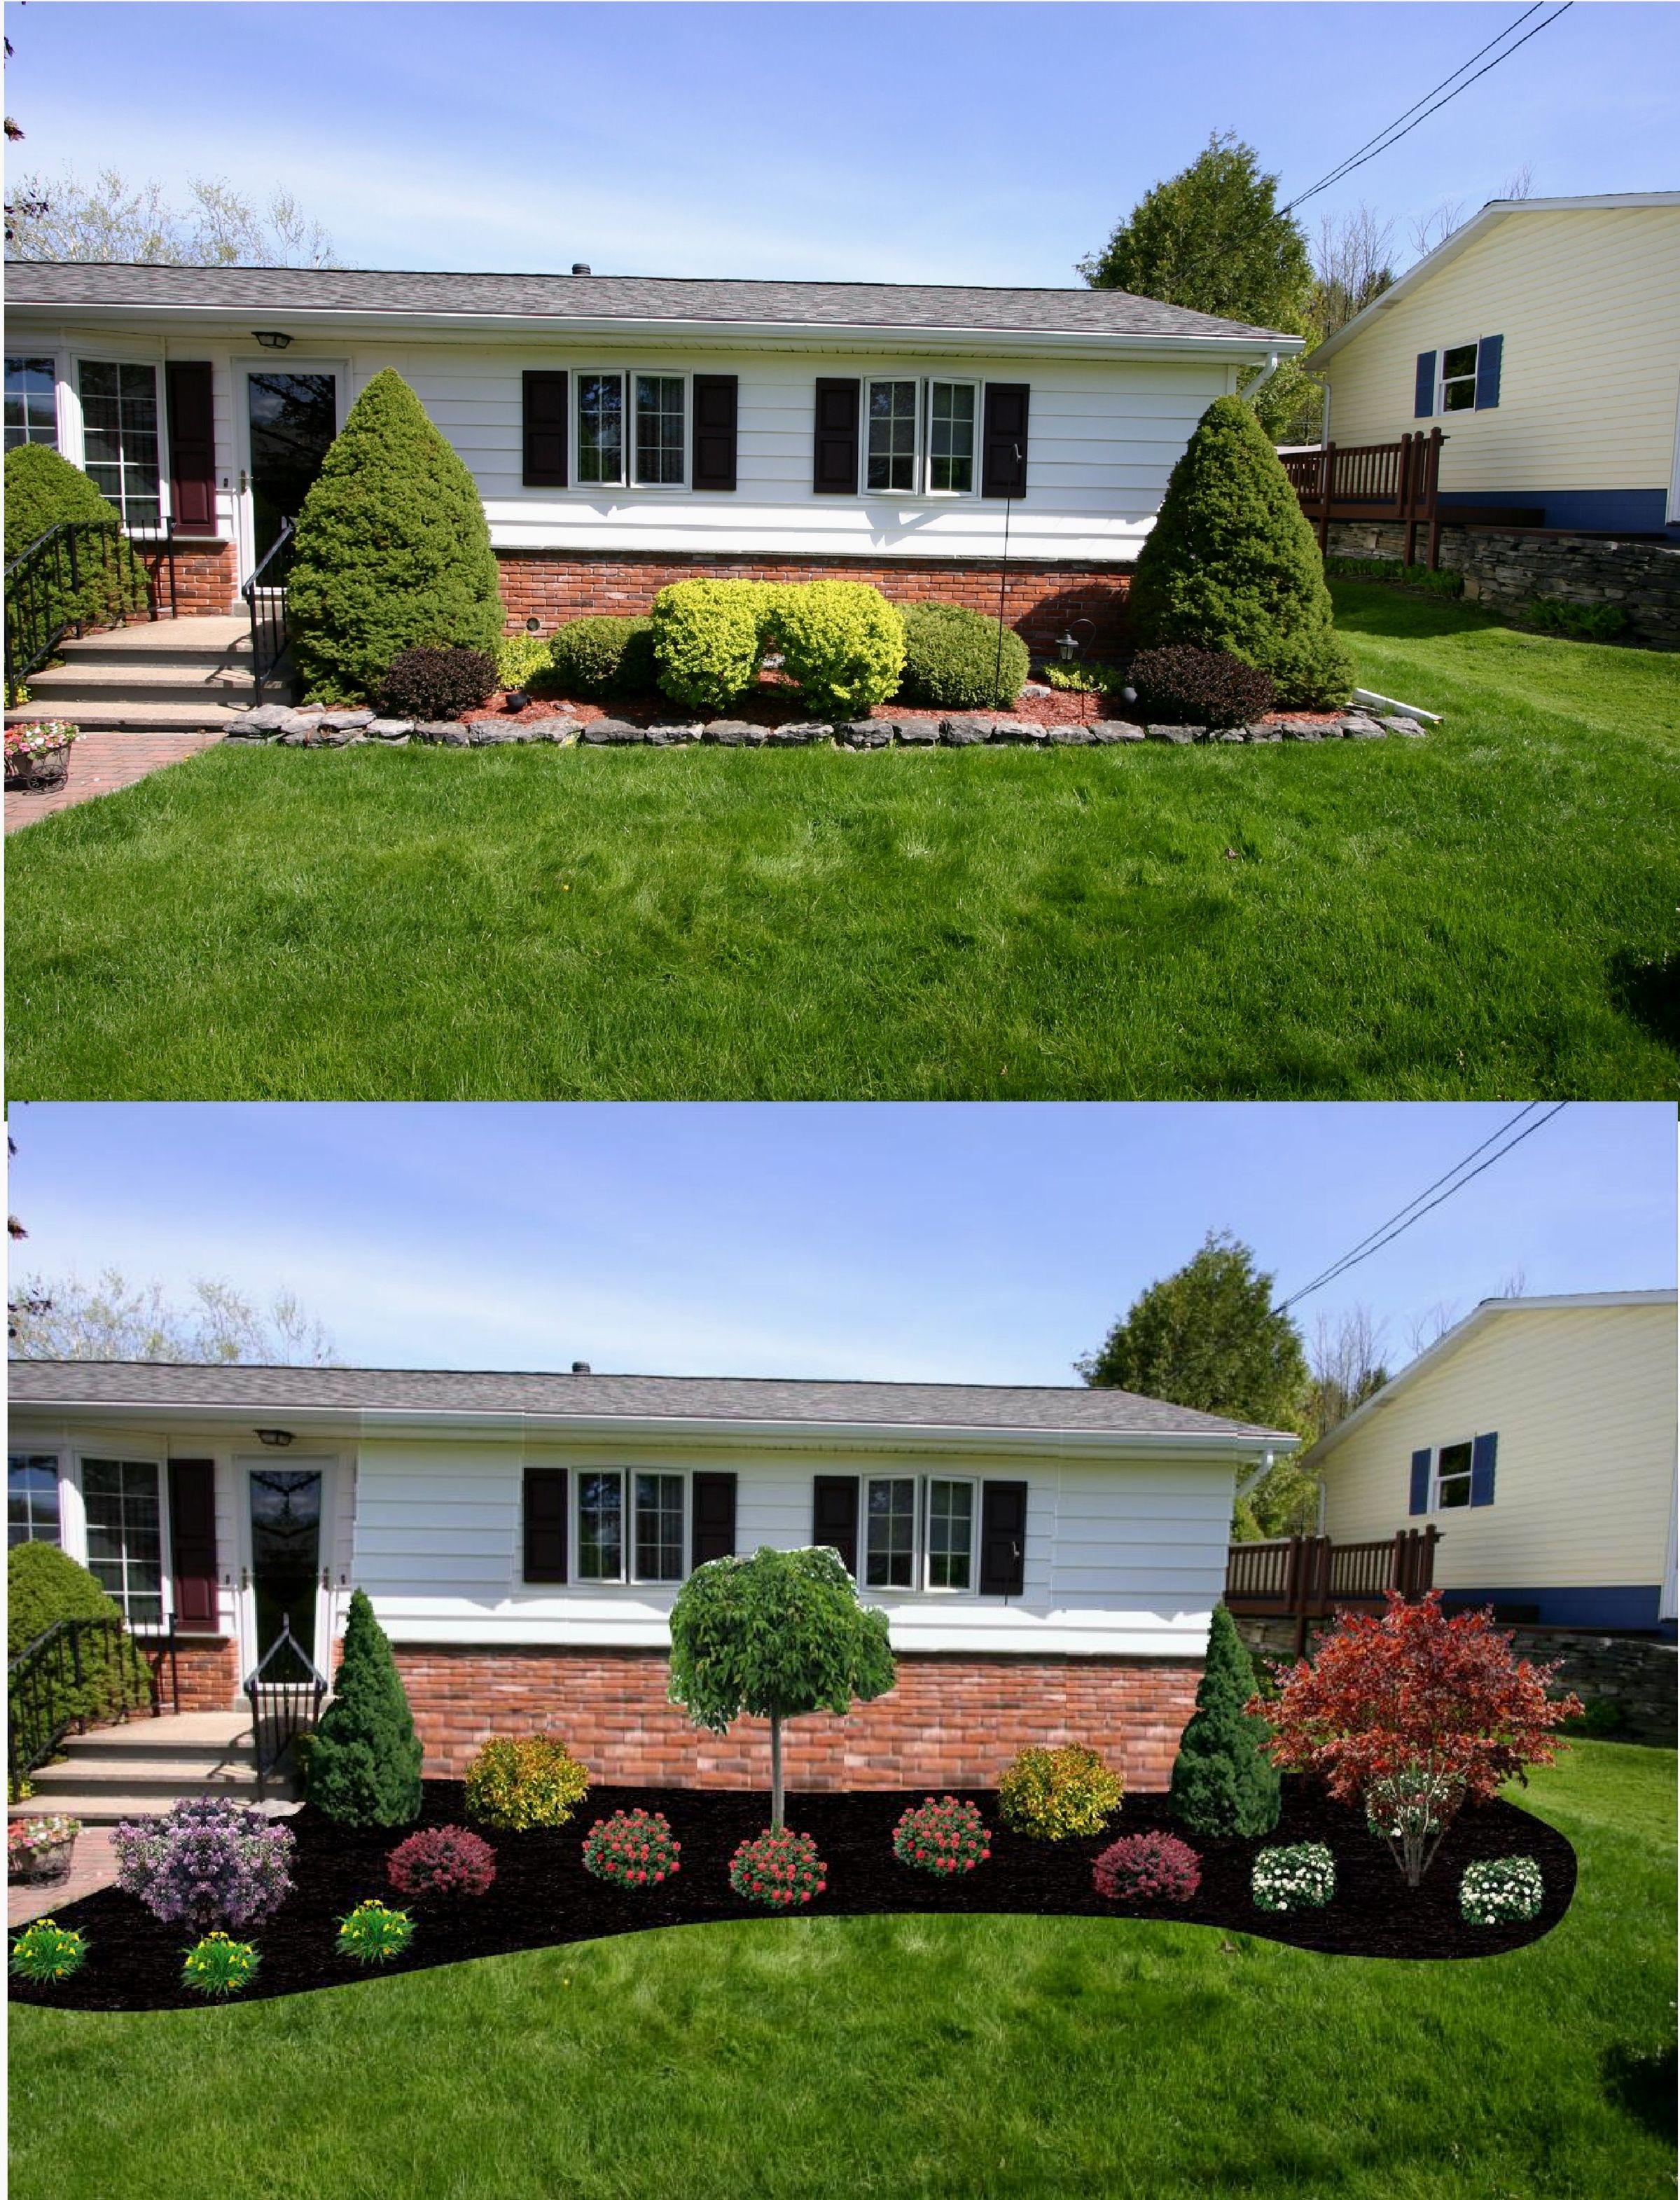 Home garden design flower  home garden design  Landscaping Front Yard  Pinterest  Front